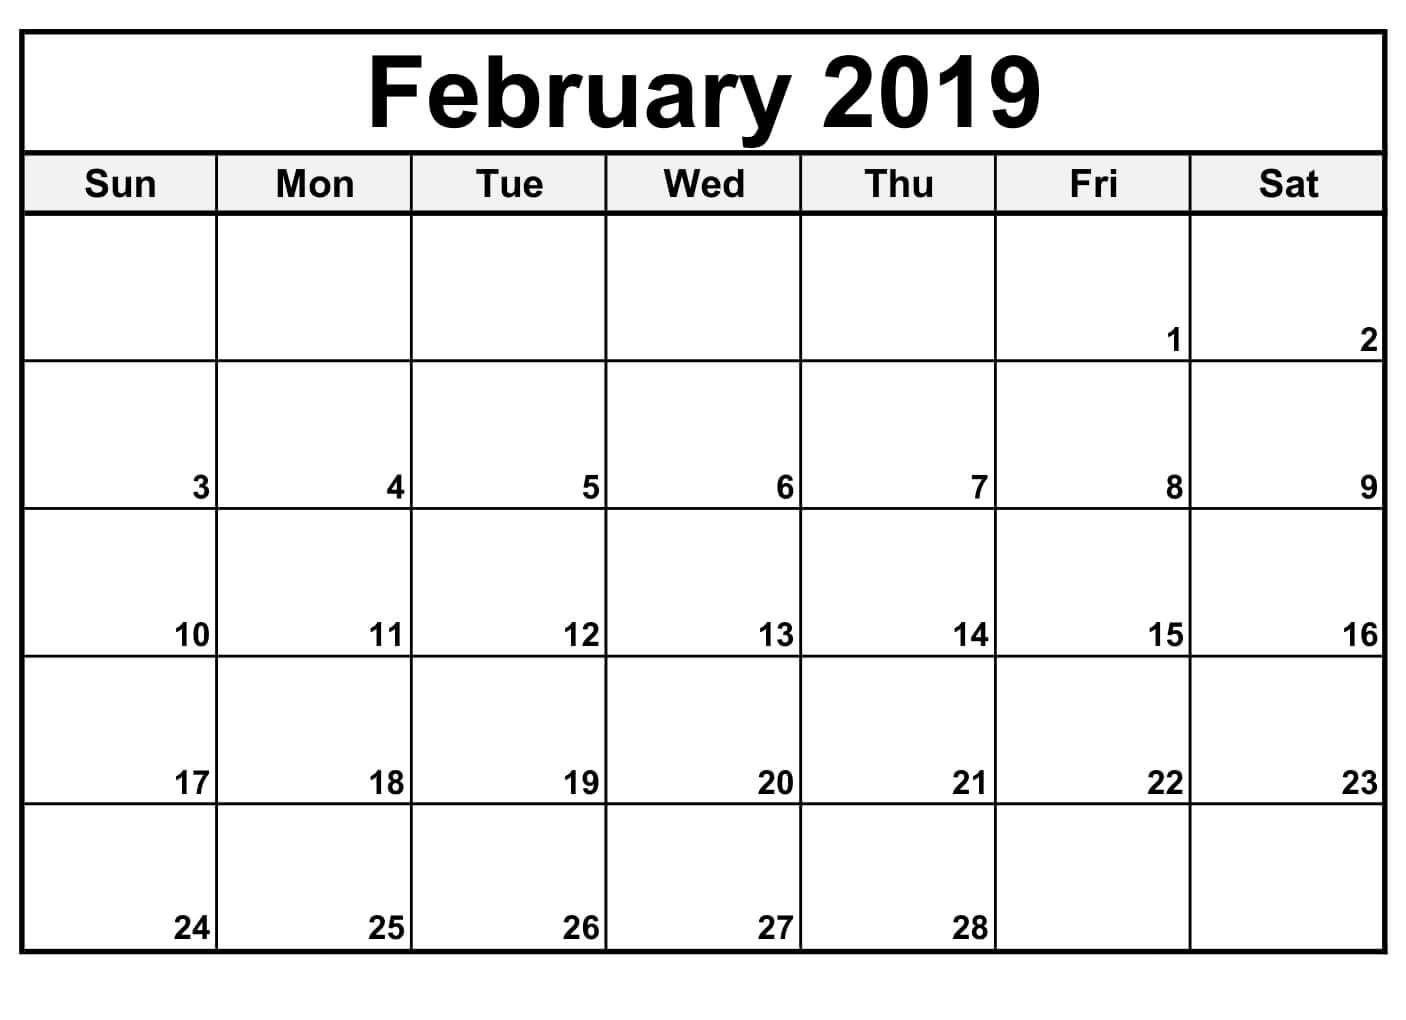 February 2019 Calendar Editable (With Images) | Blank